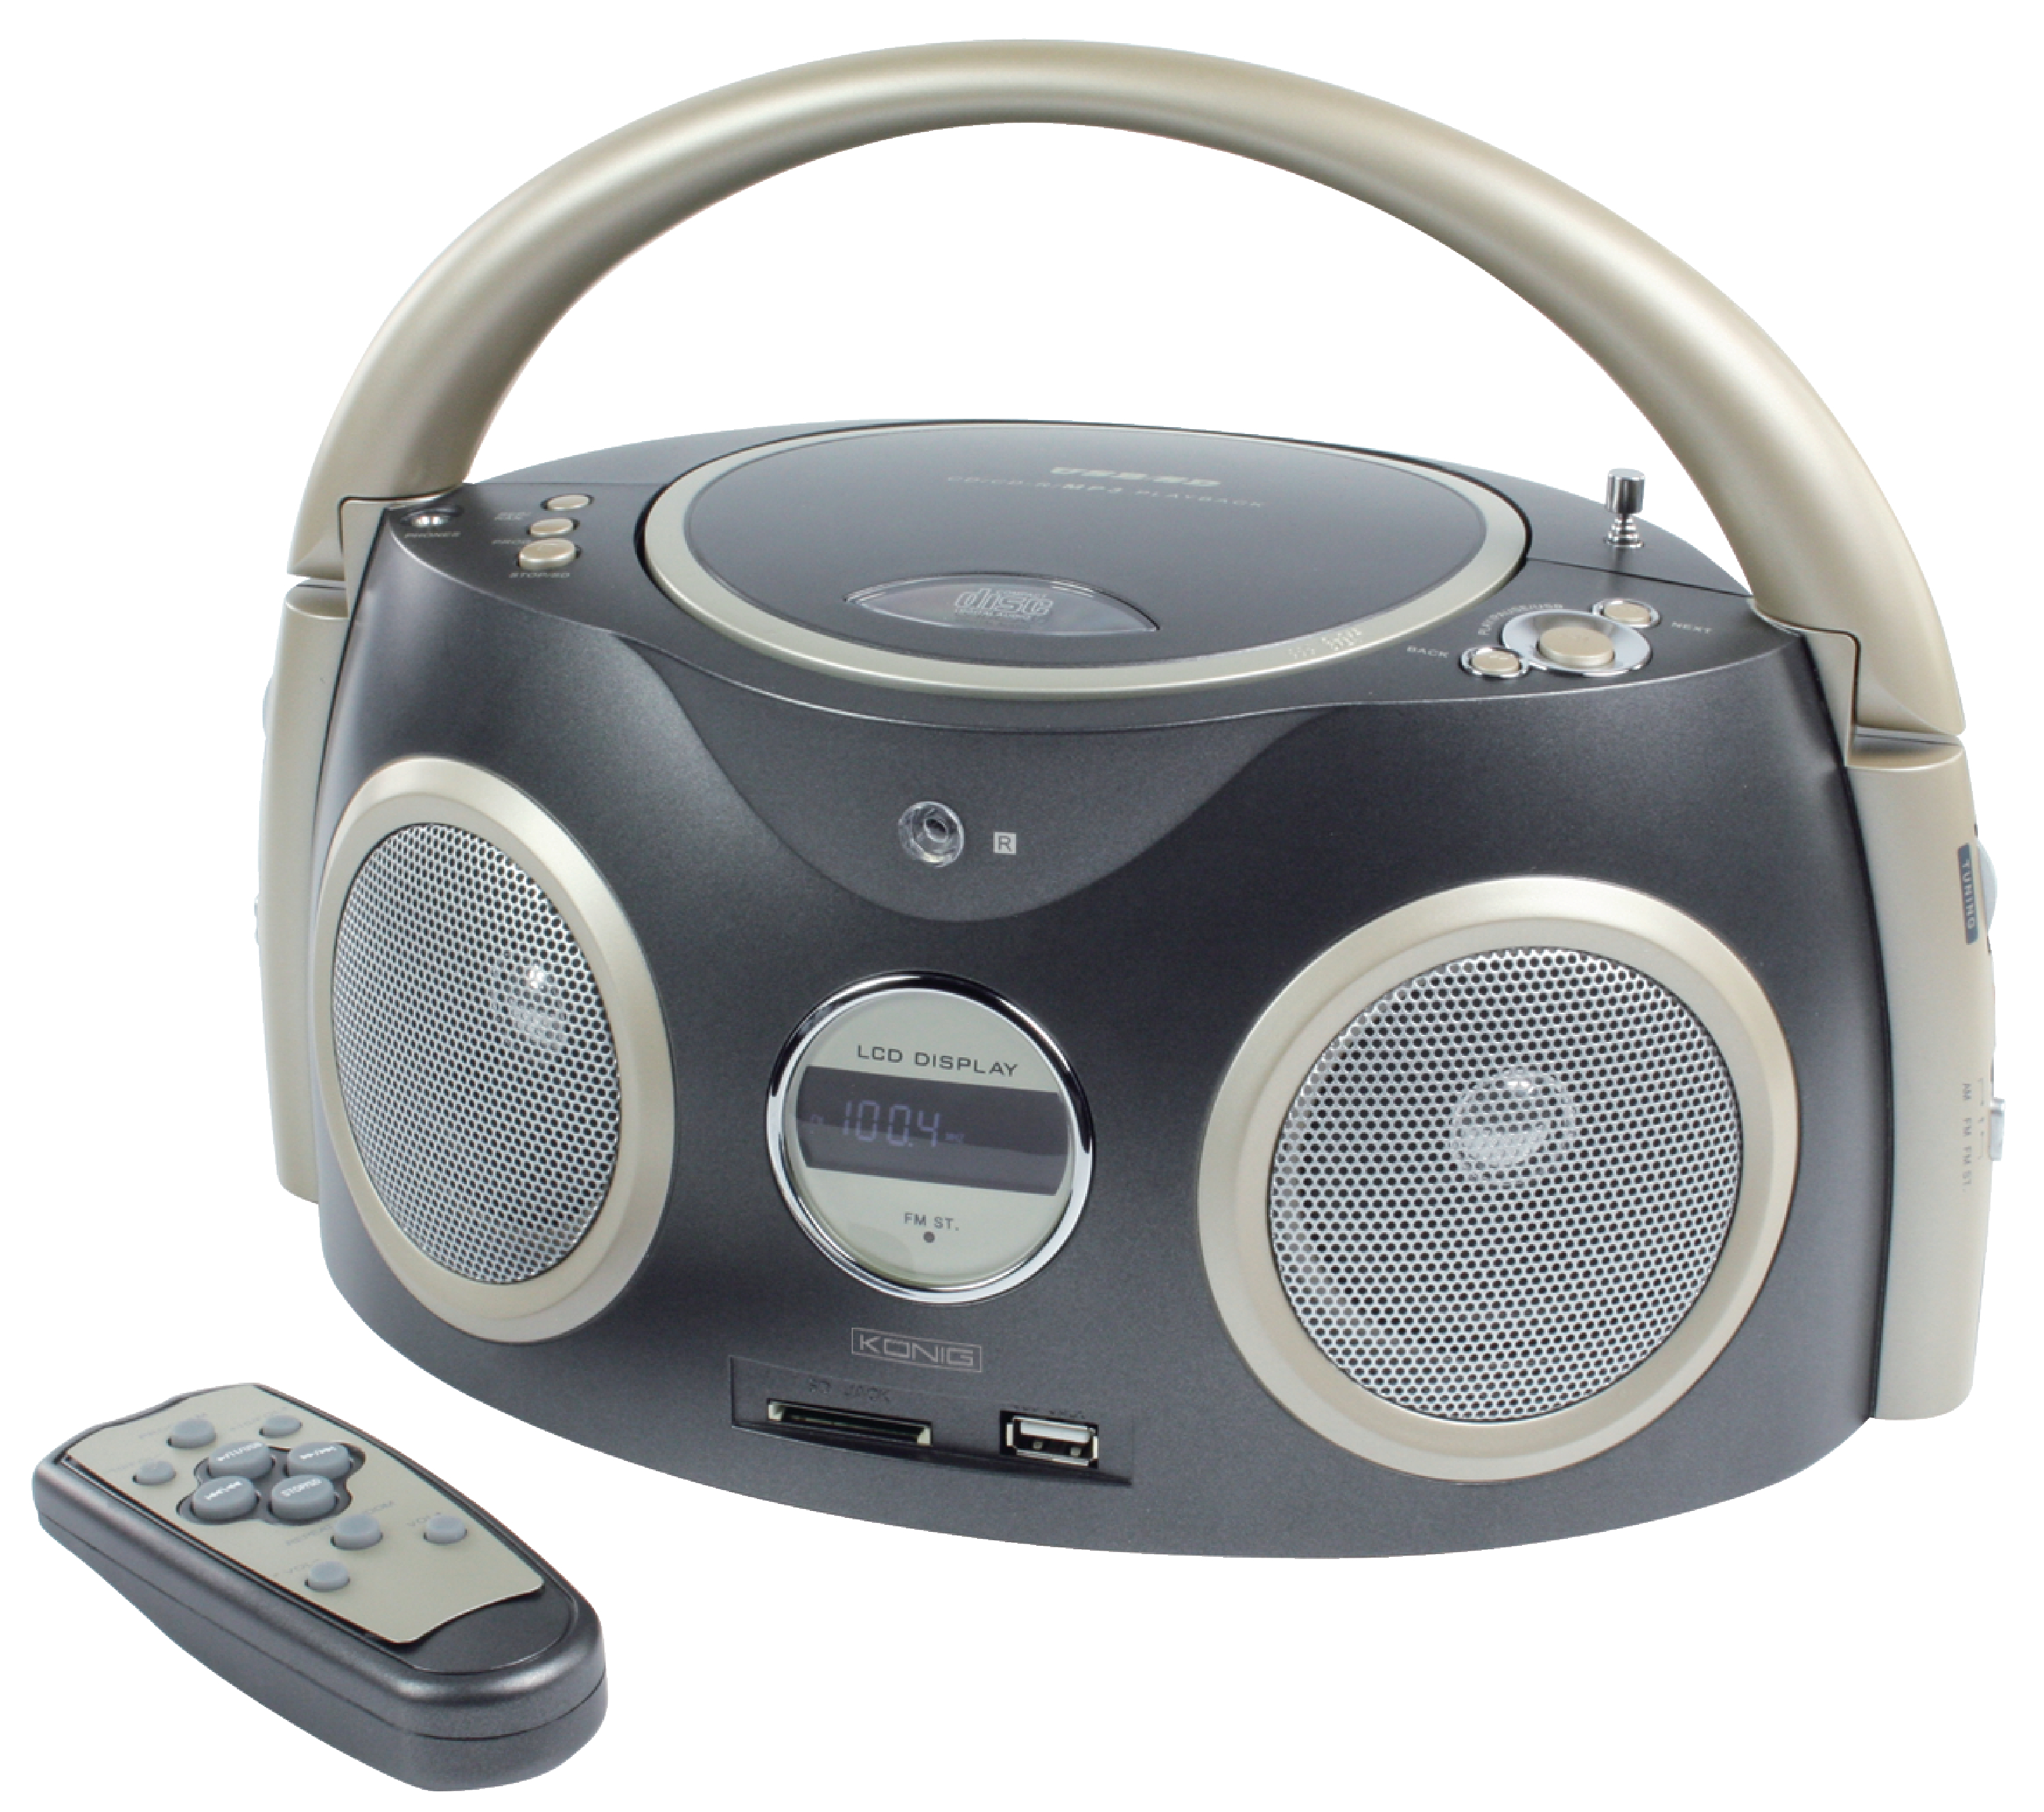 k nig ukw mw radio mit cd player usb sd slot und. Black Bedroom Furniture Sets. Home Design Ideas